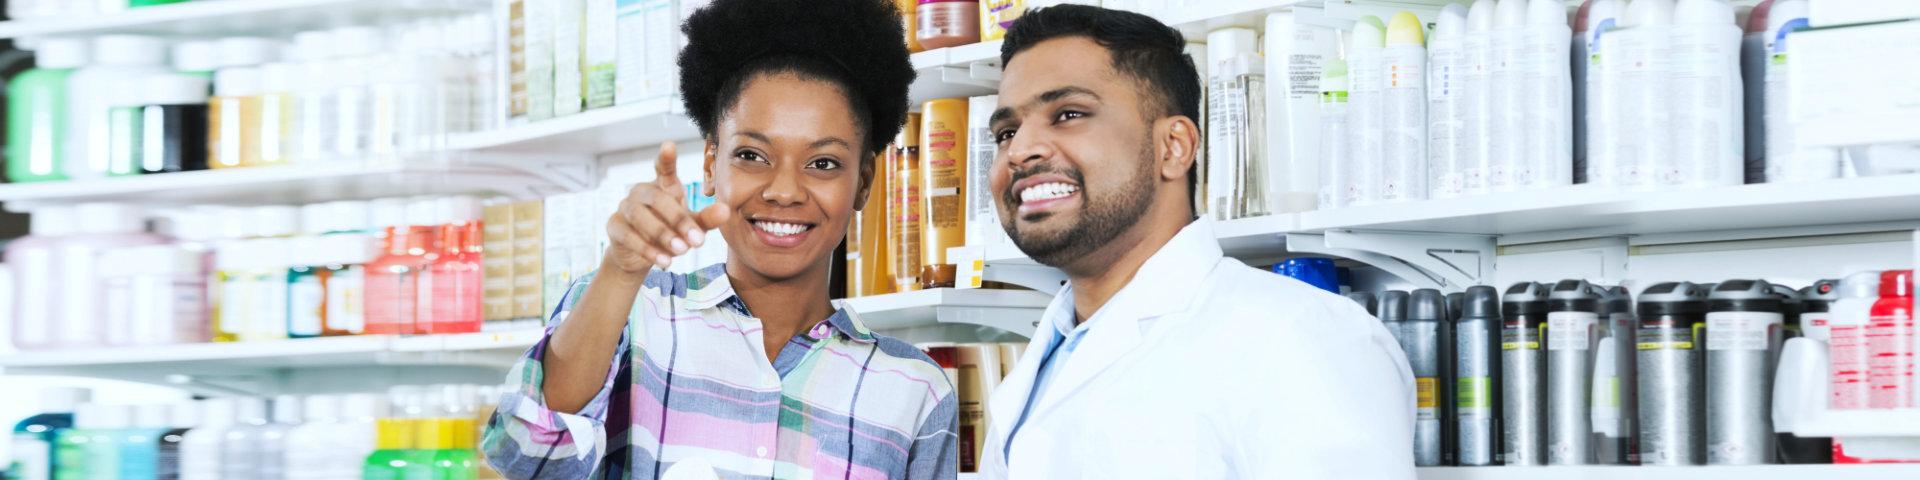 New Pharmacy Customer